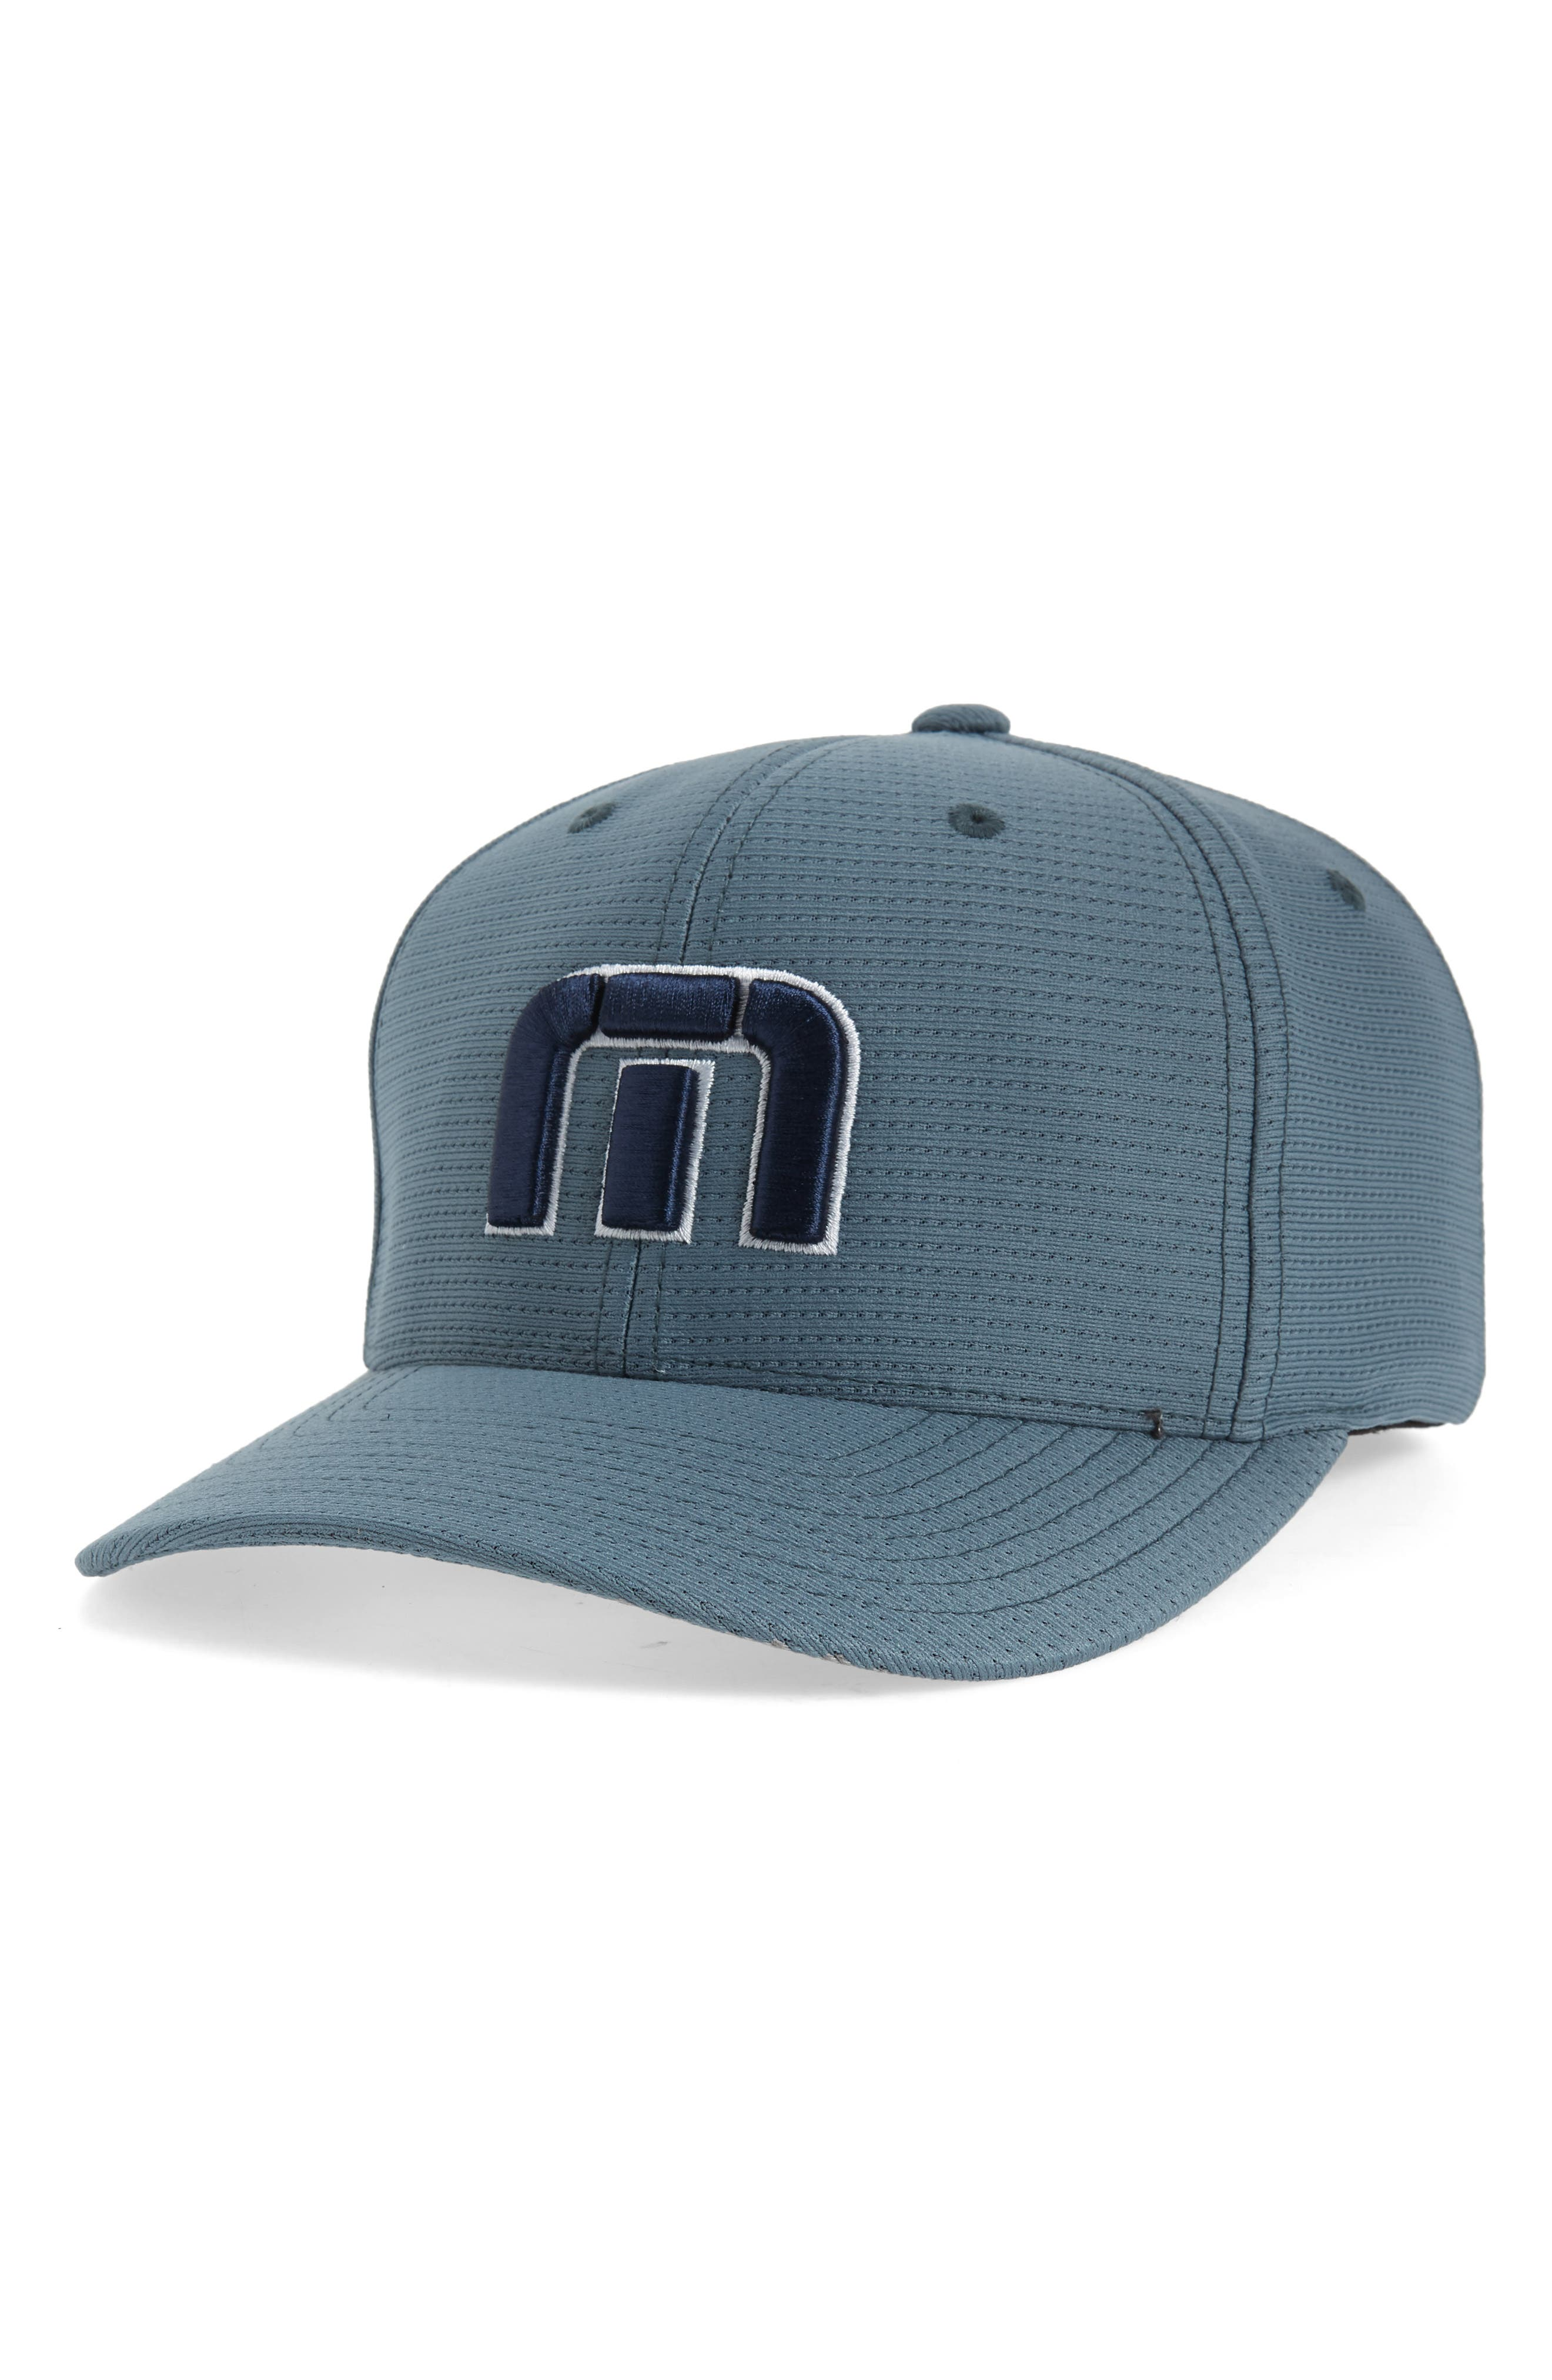 Men s Blue Golf Accessories   Gear  5b3a3555a29a